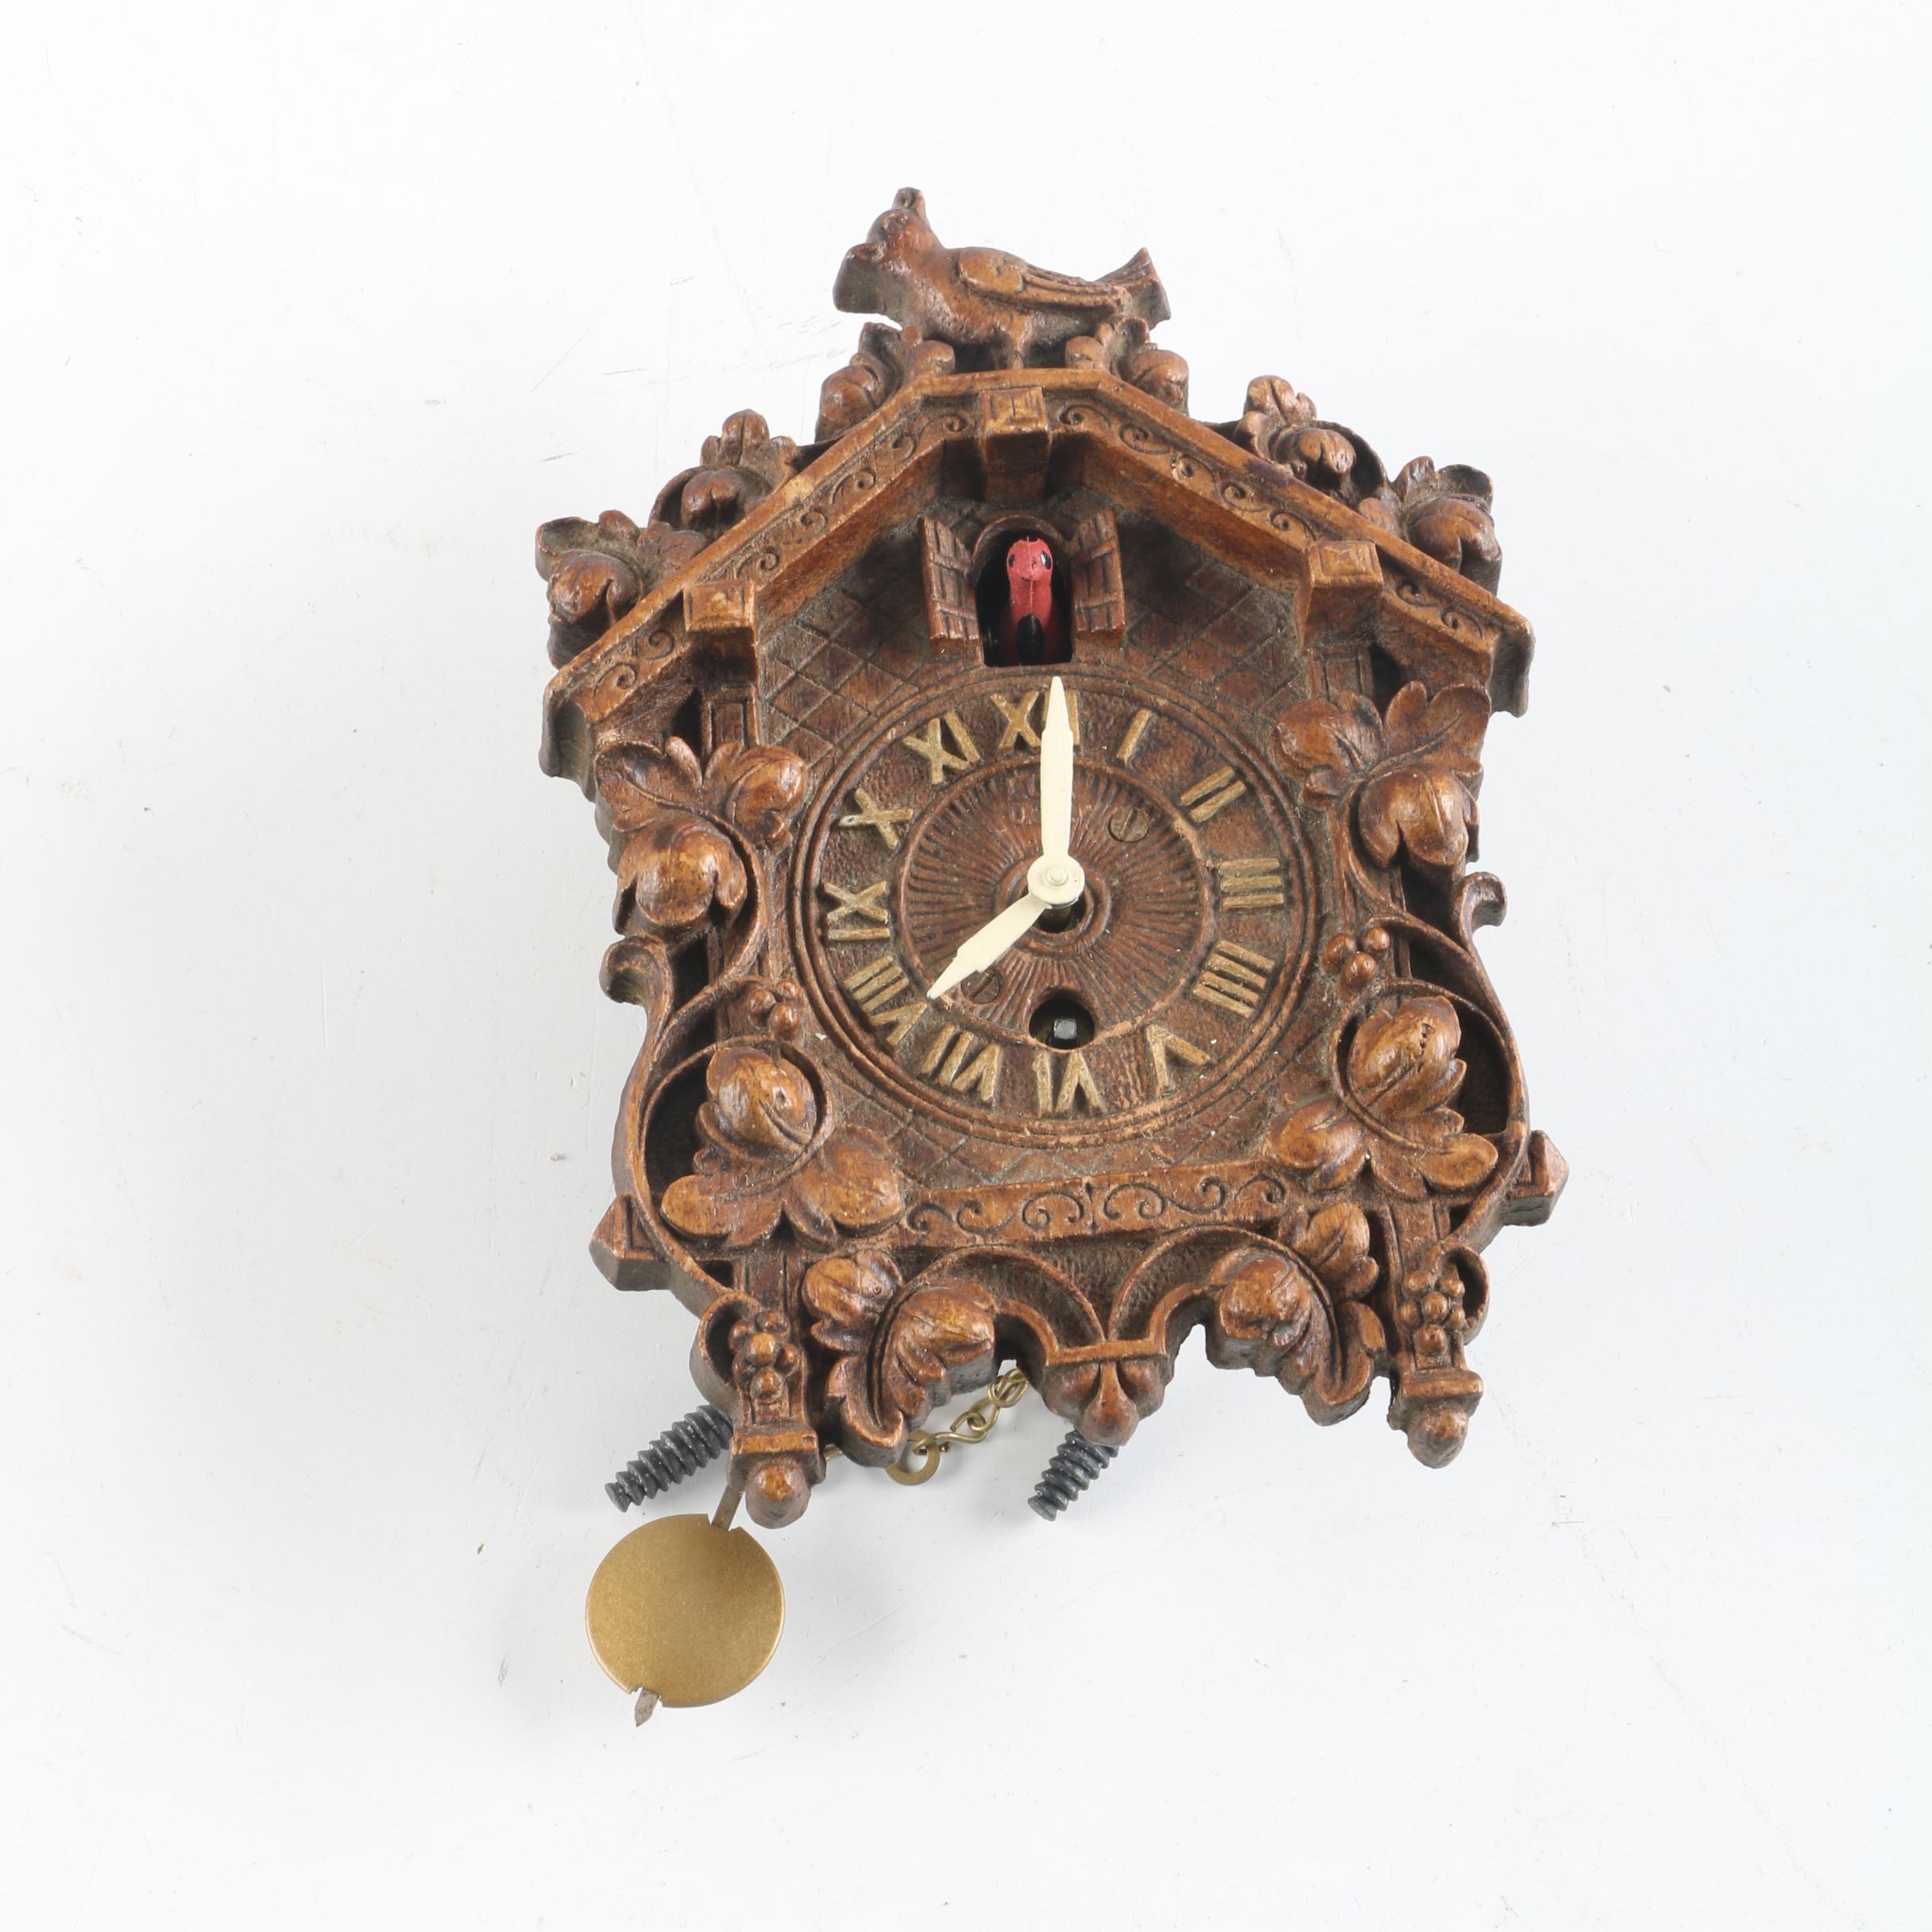 Vintage Lux Clock Miniature Cuckoo Clock